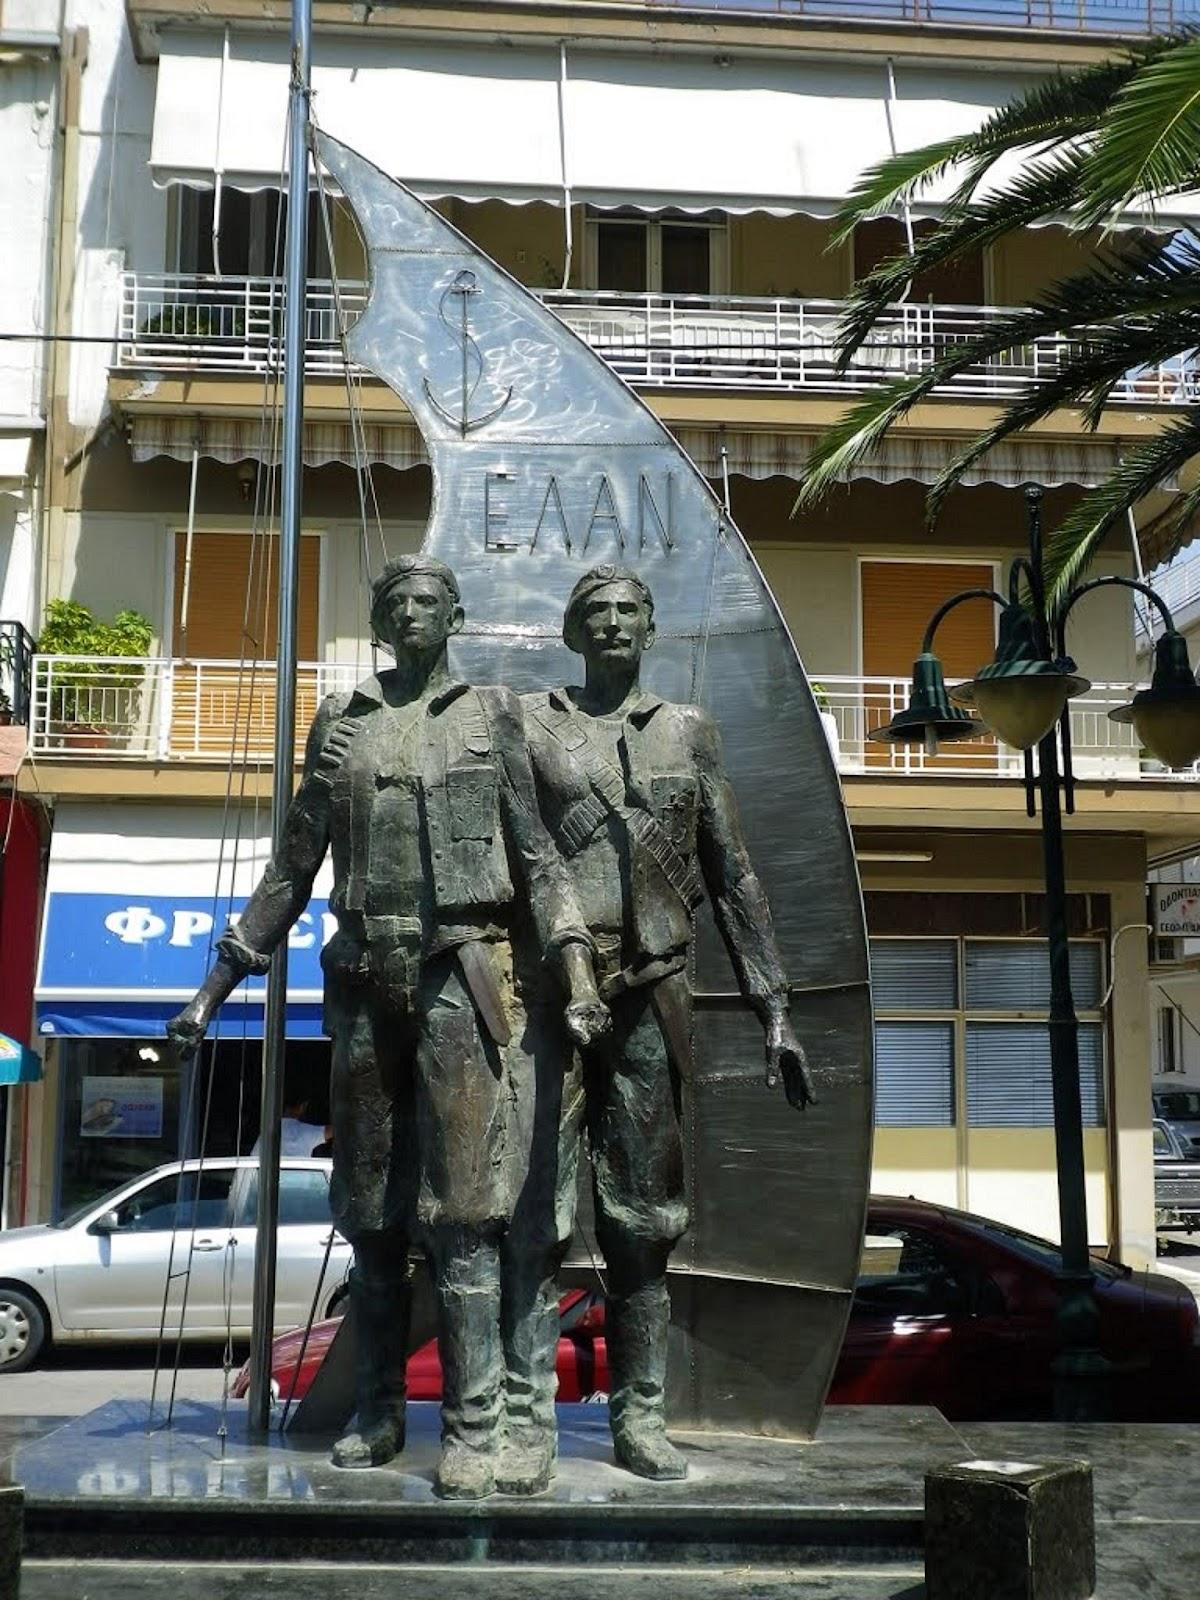 Lexar:ΕΛΑΝ ΜΙΚΡΕΣ ΦΩΤ:Μνημείο του ΕΛΑΝ στην Αντίκυρα.jpg